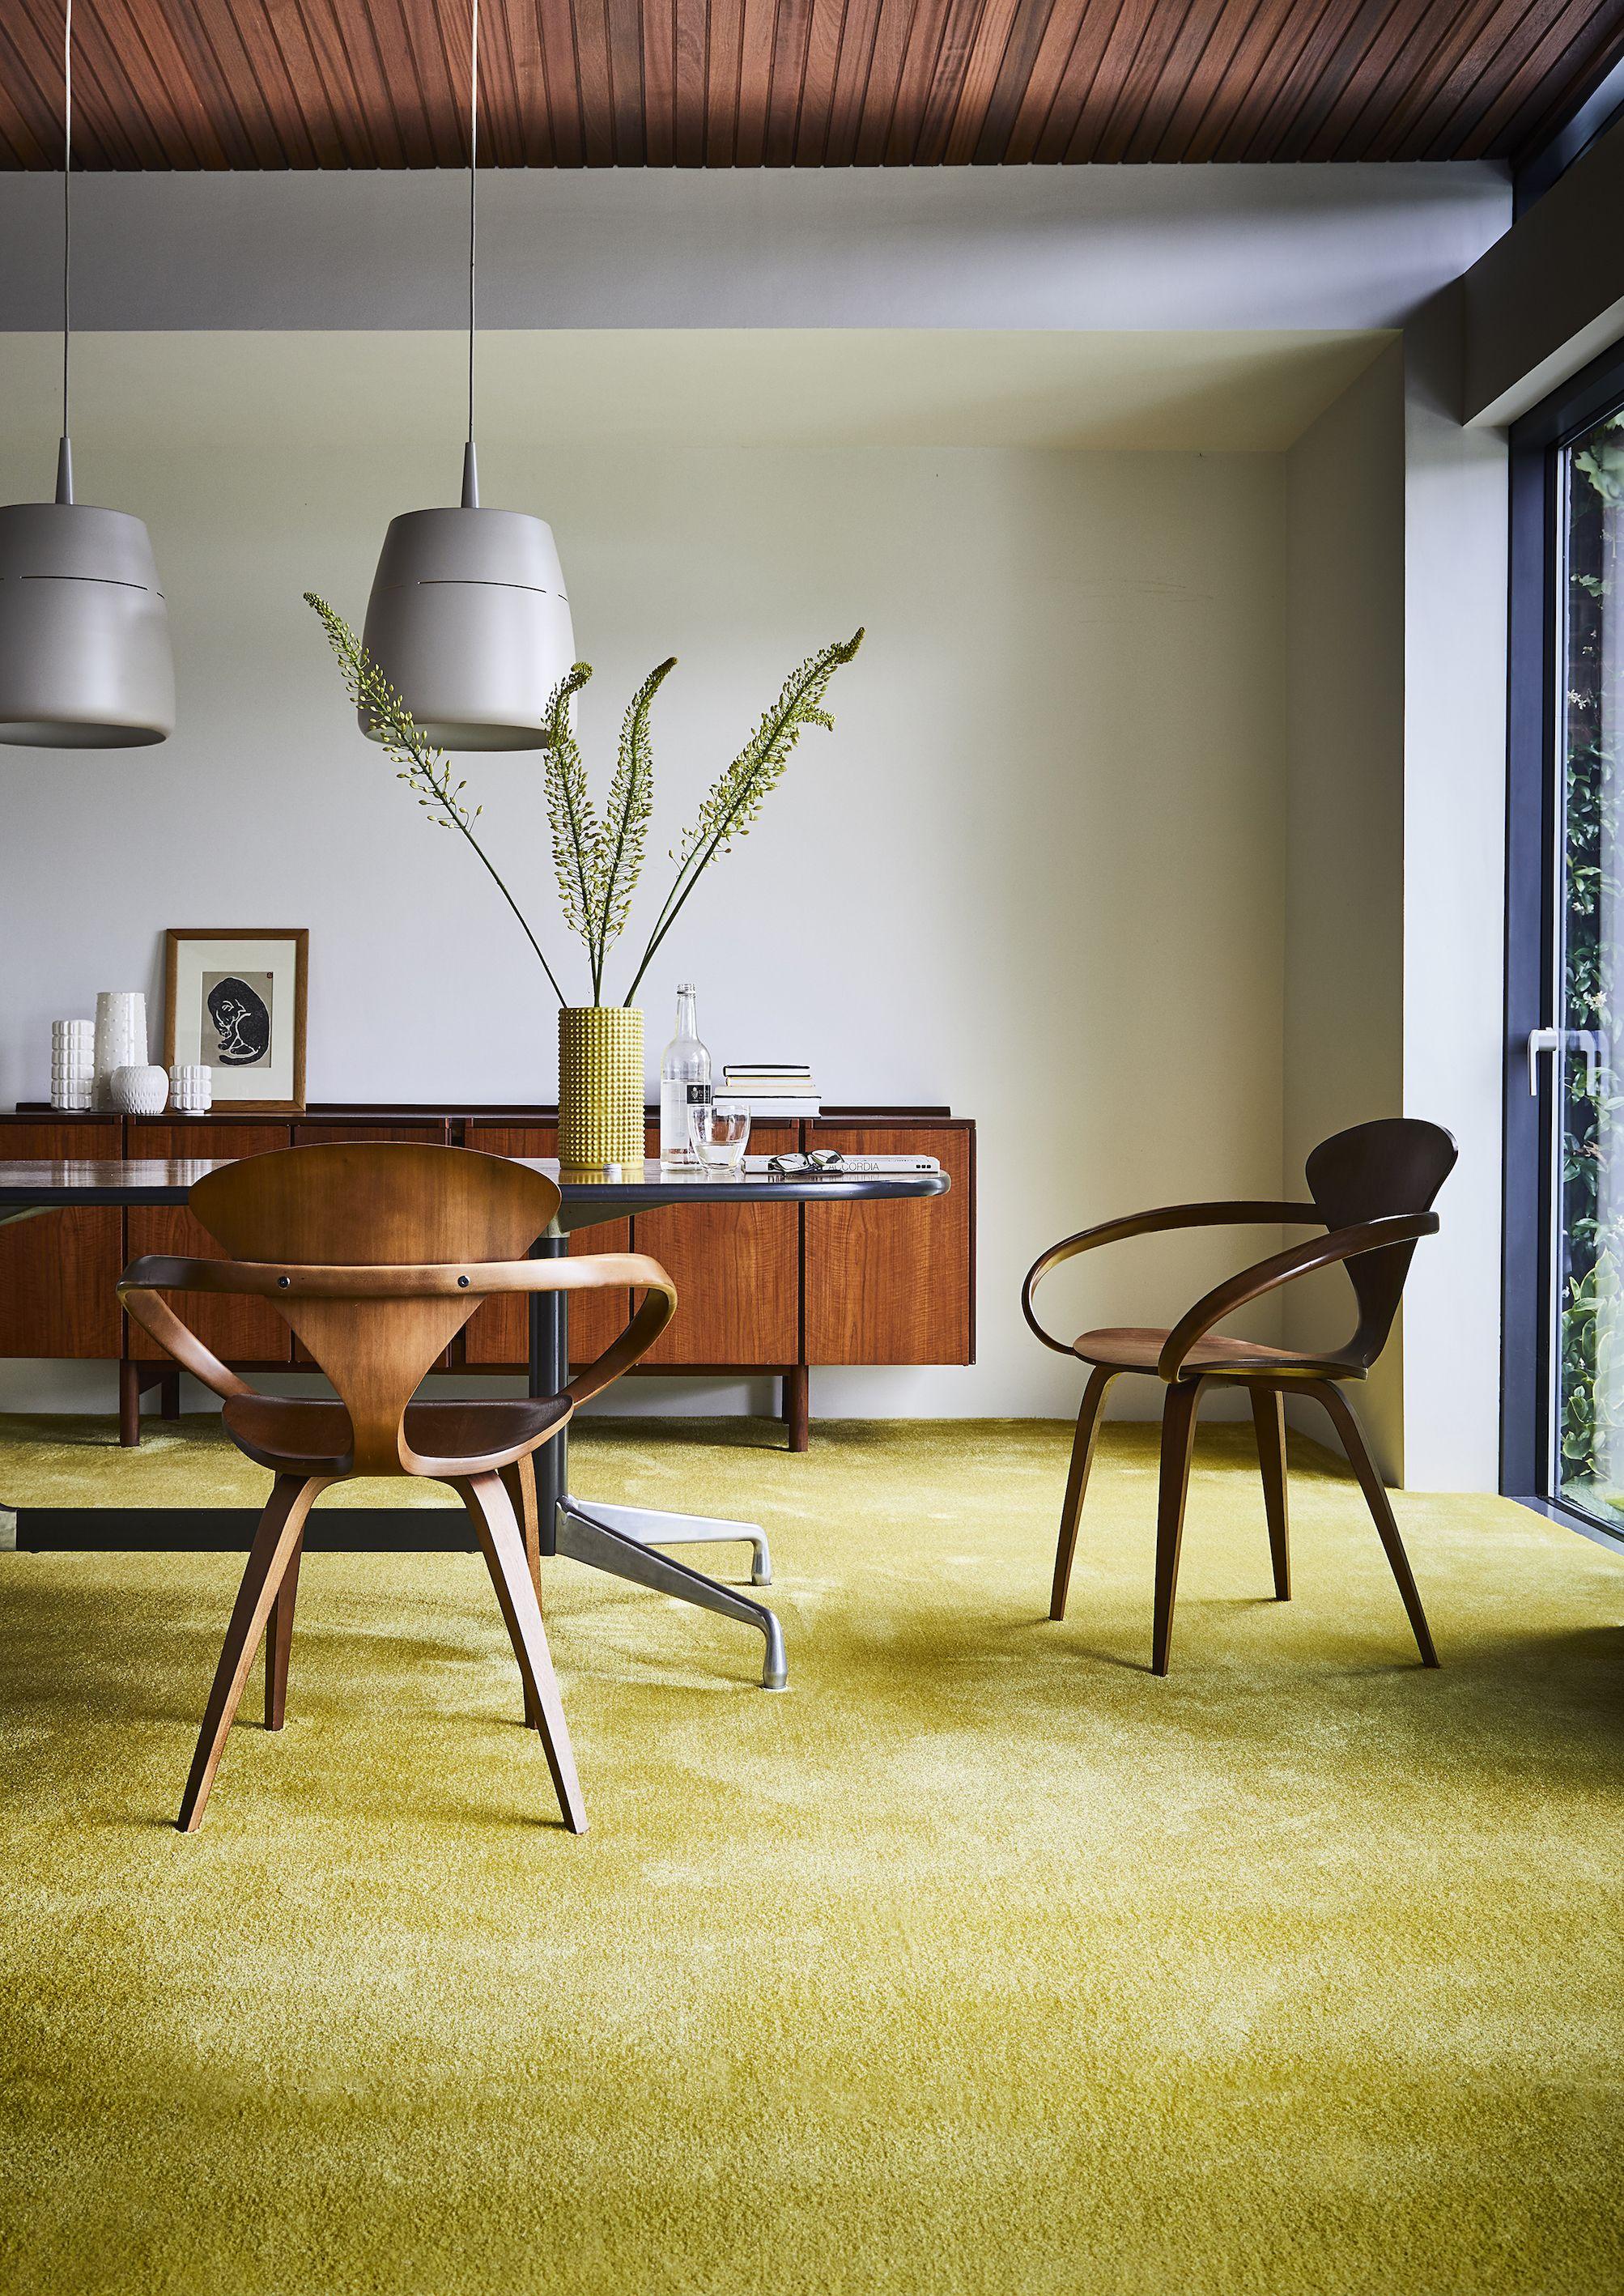 10 best autumn winter 2018 interior design trends home design ideas rh housebeautiful com furniture interior design websites furniture interior design courses